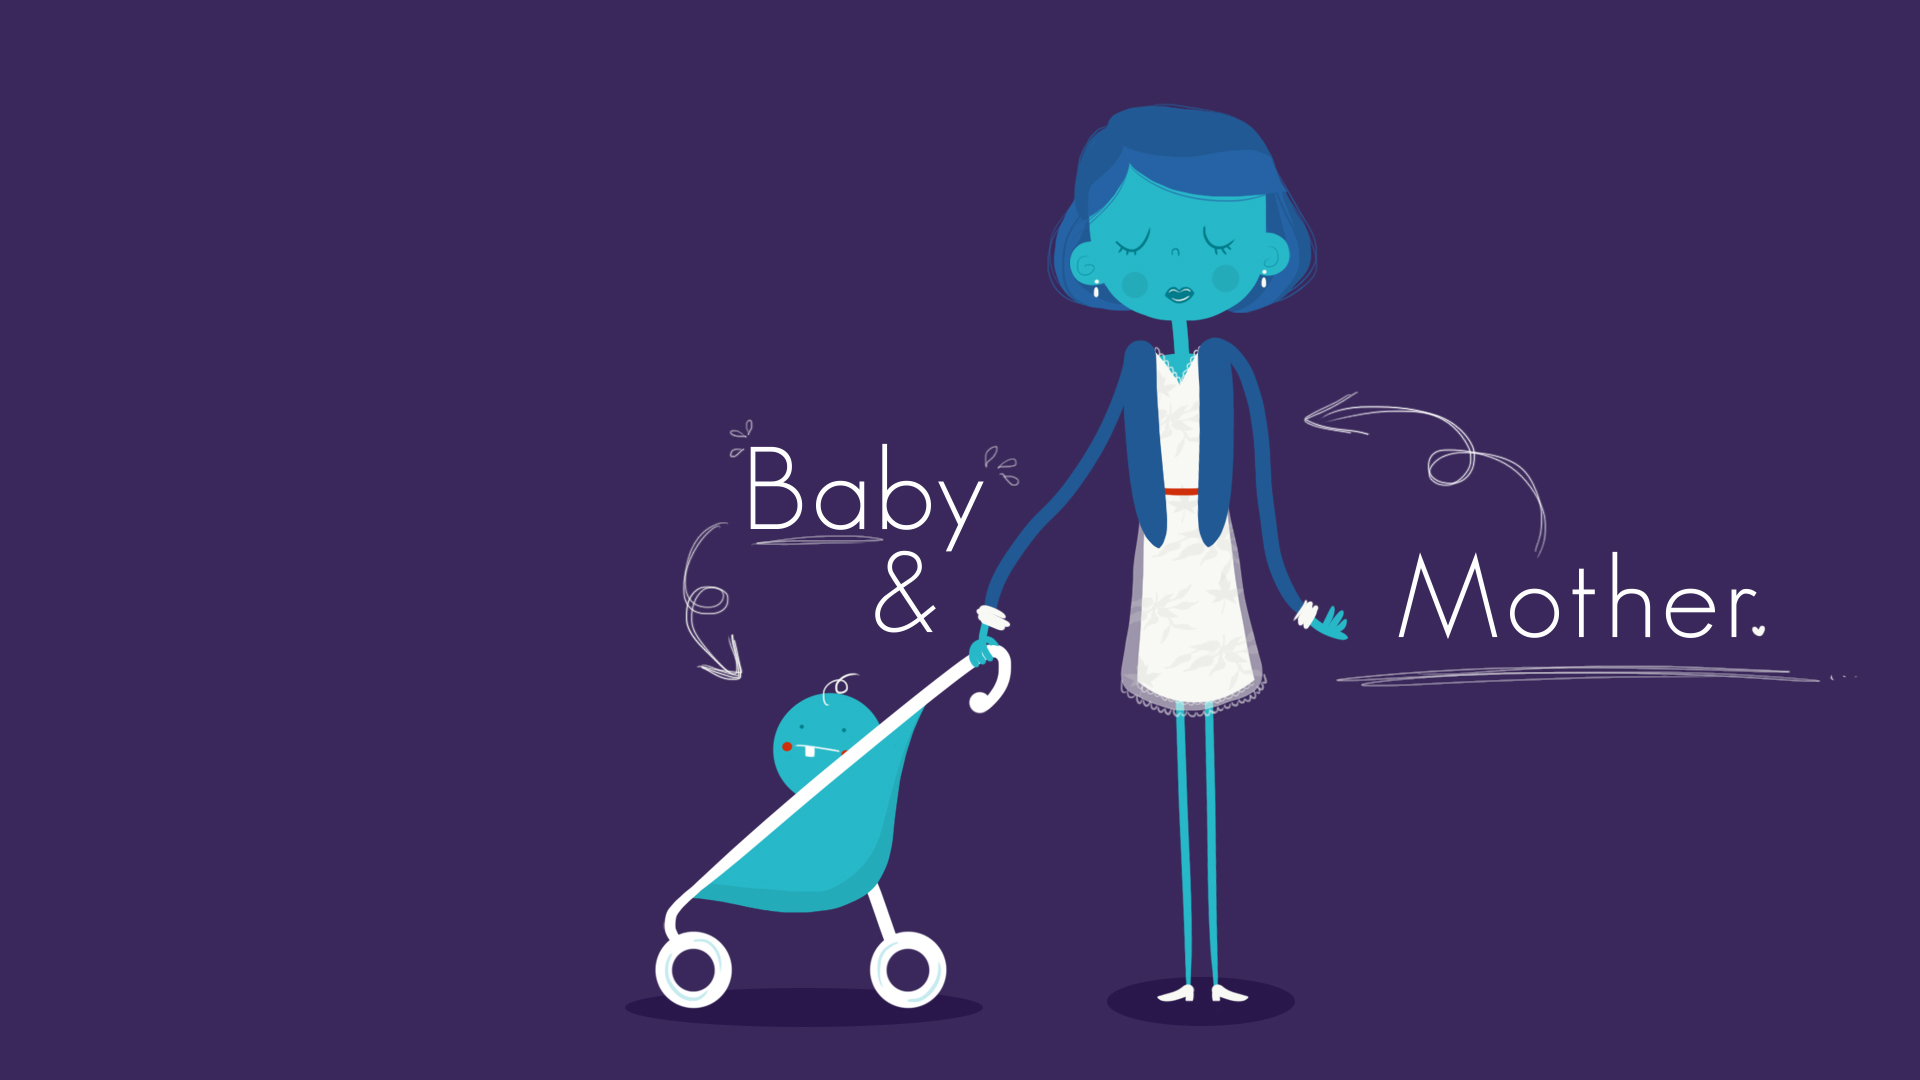 05_MOTHER&BABY.jpg